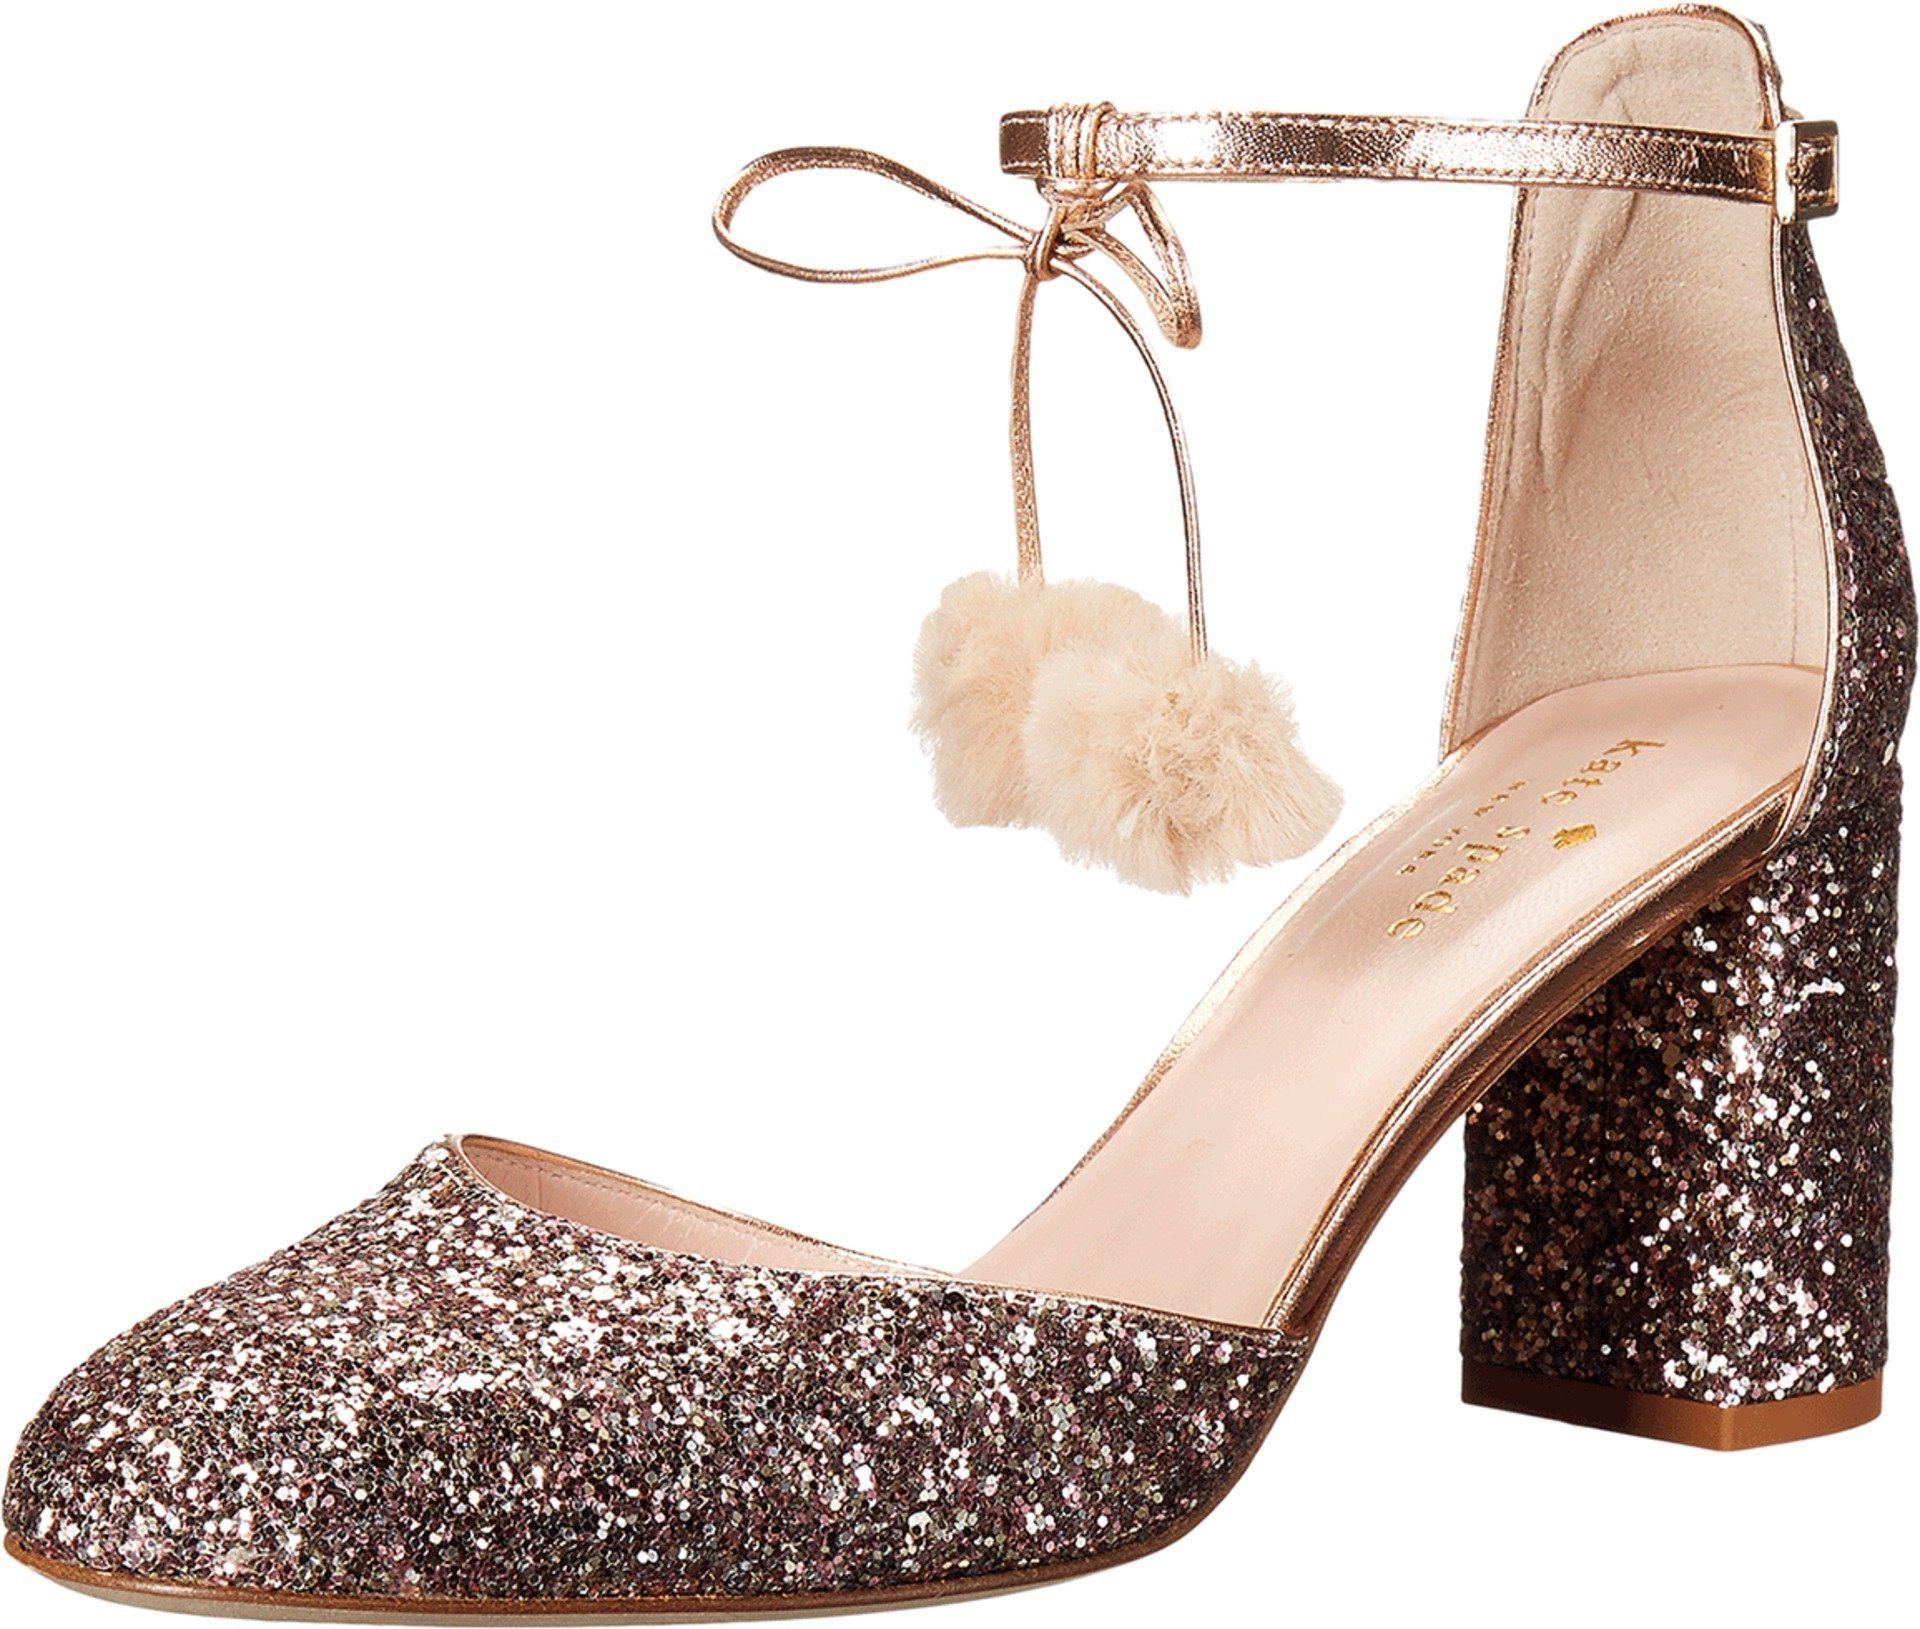 Glitter pumps, Heels, Shoes